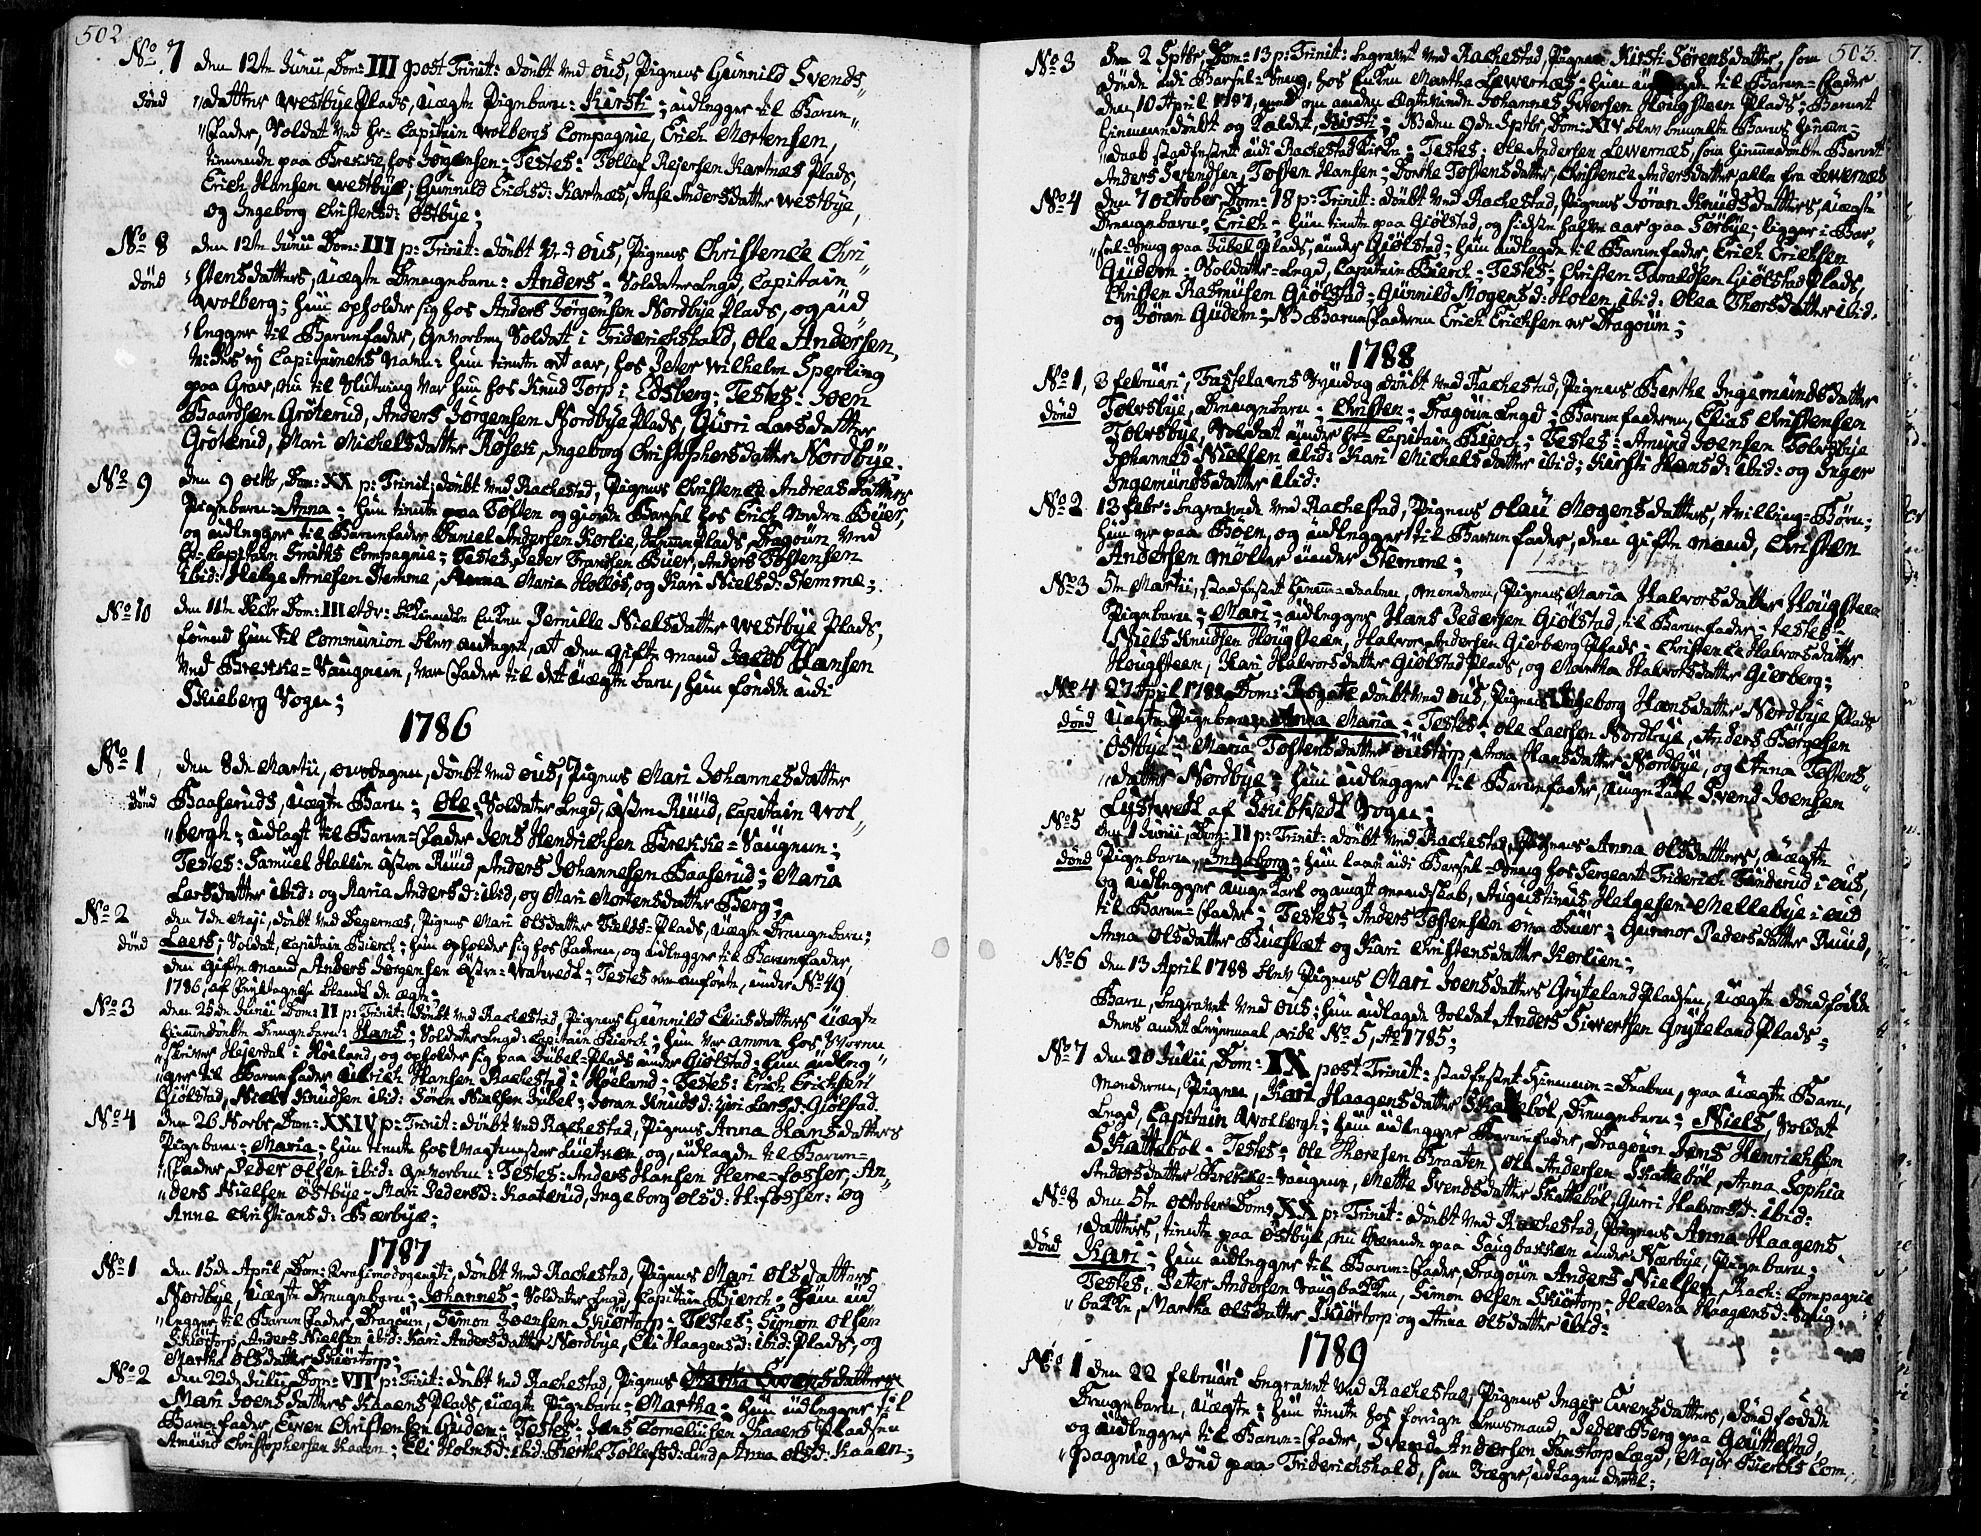 SAO, Rakkestad prestekontor Kirkebøker, F/Fa/L0005: Ministerialbok nr. I 5, 1784-1814, s. 502-503